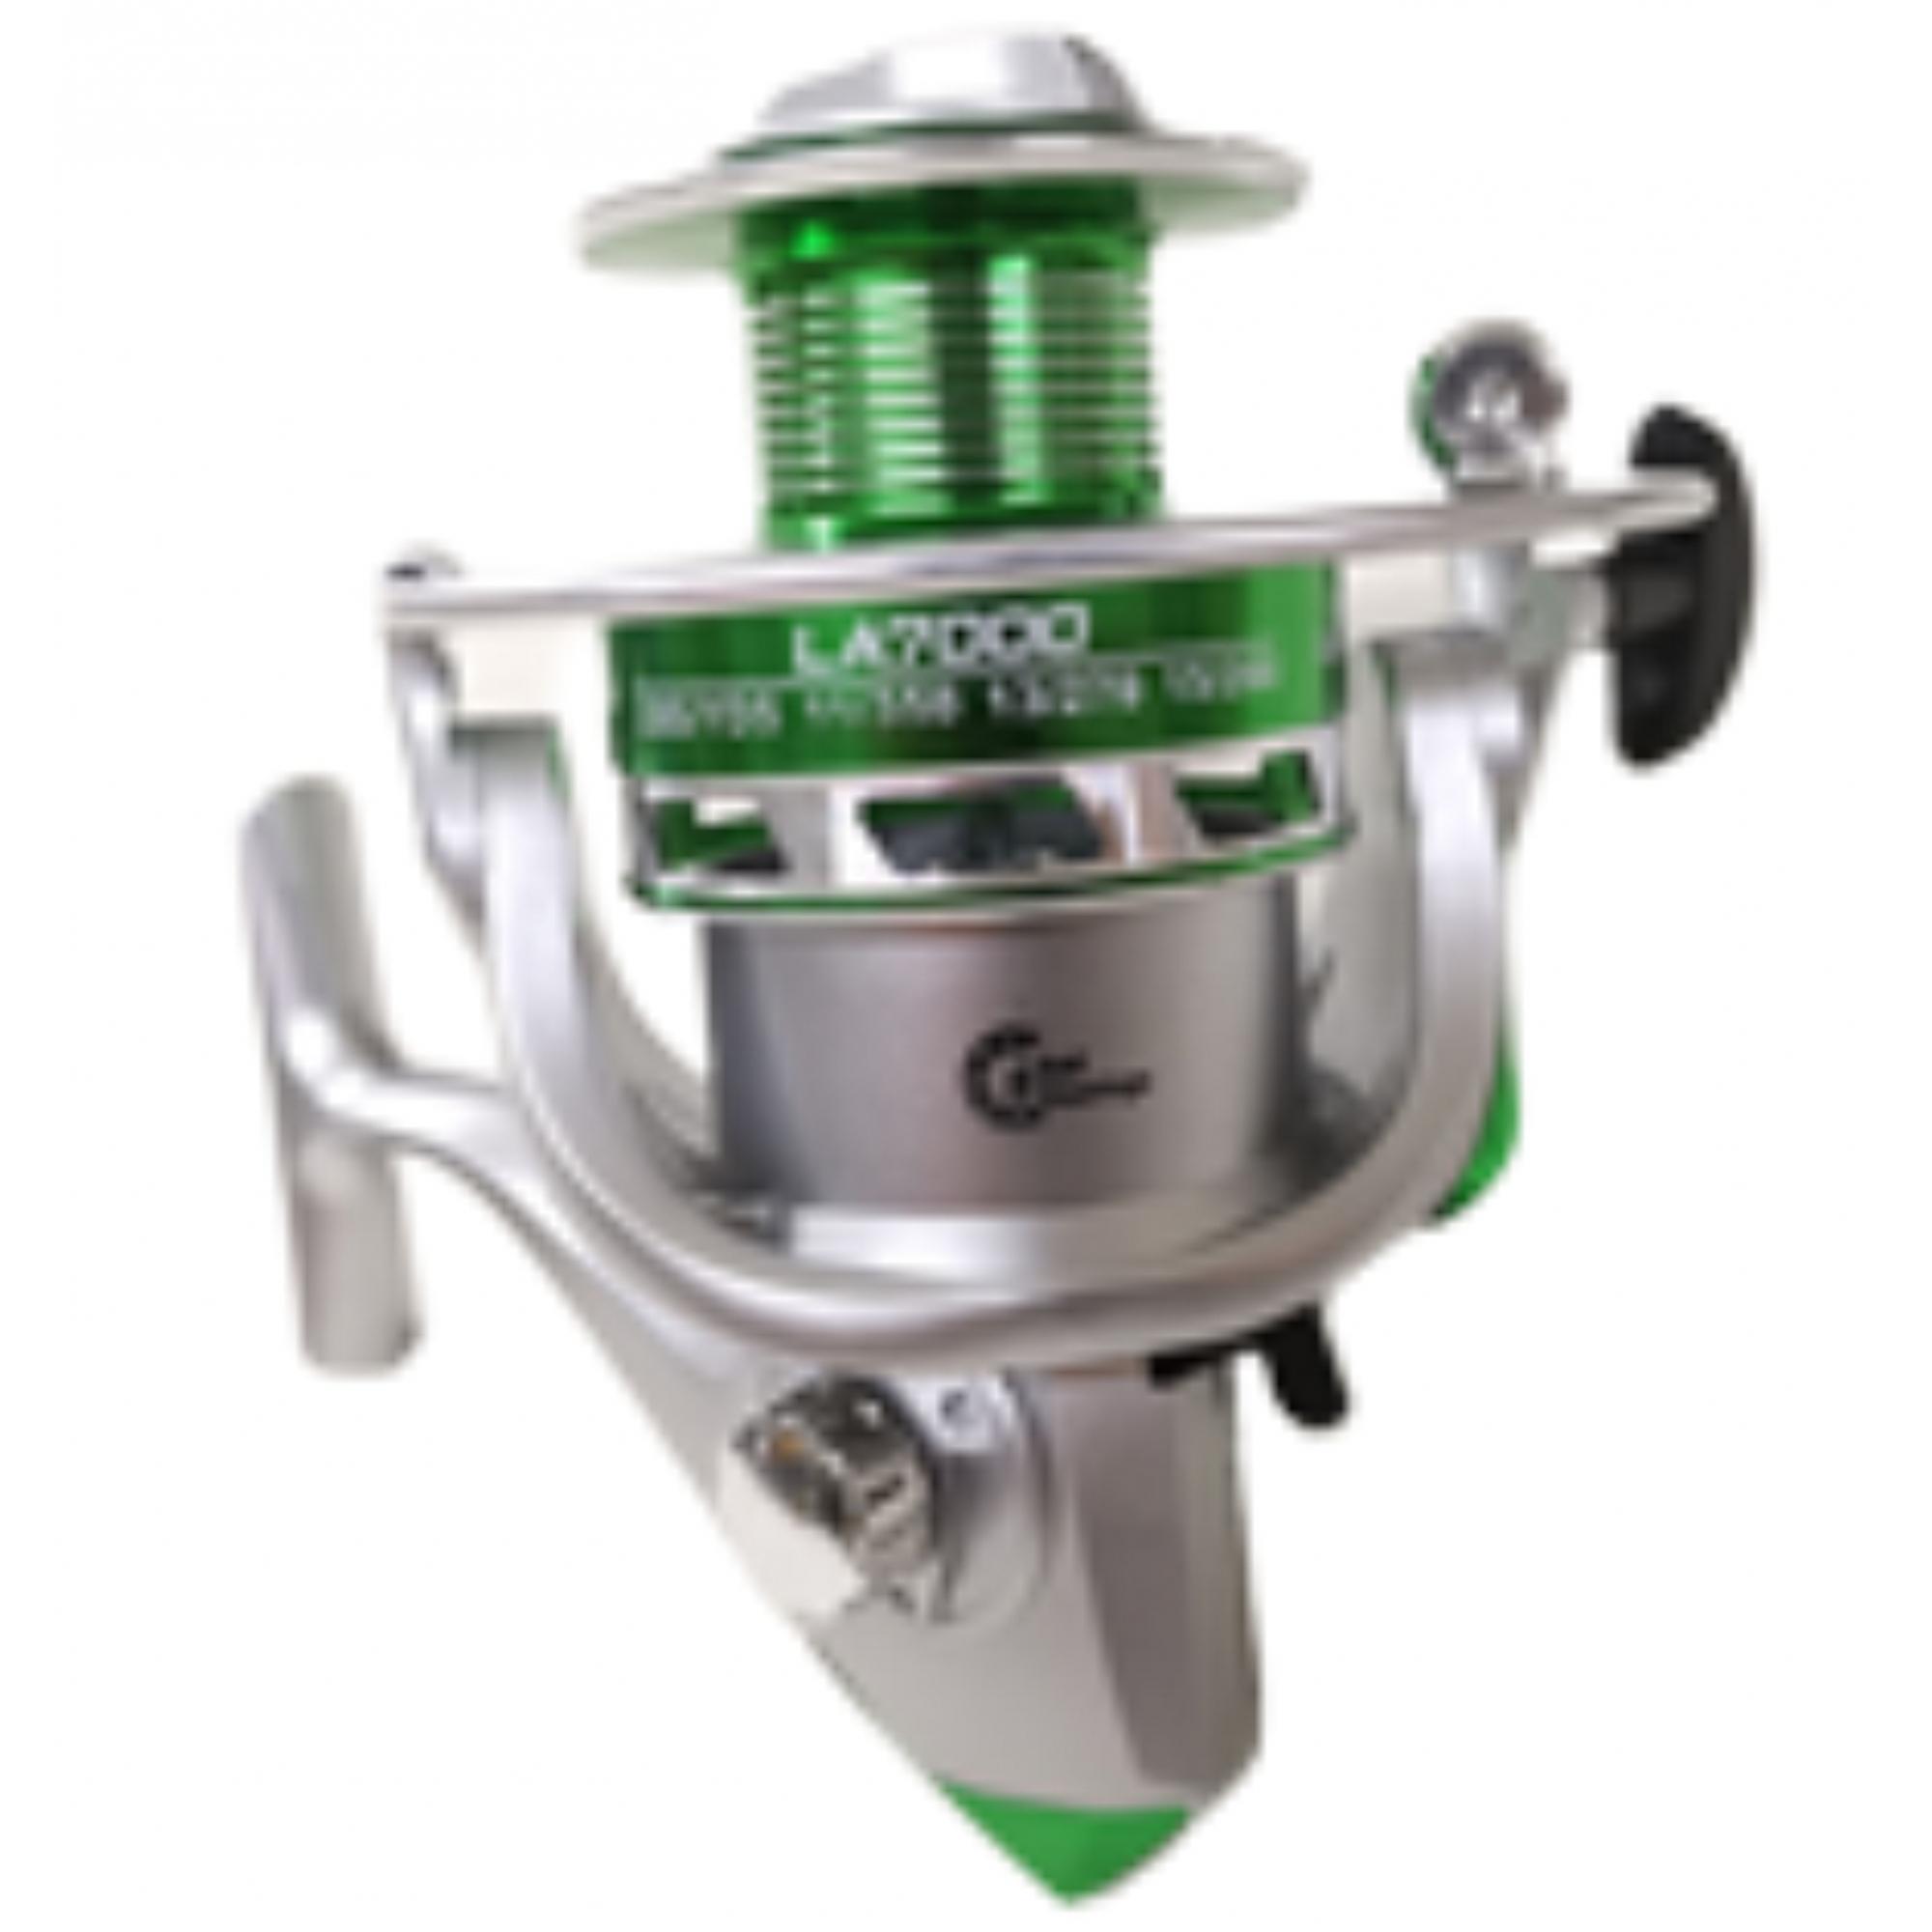 Molinete 6000 LA 6 Rolamento Carretel Alumínio Drag 6,5kg